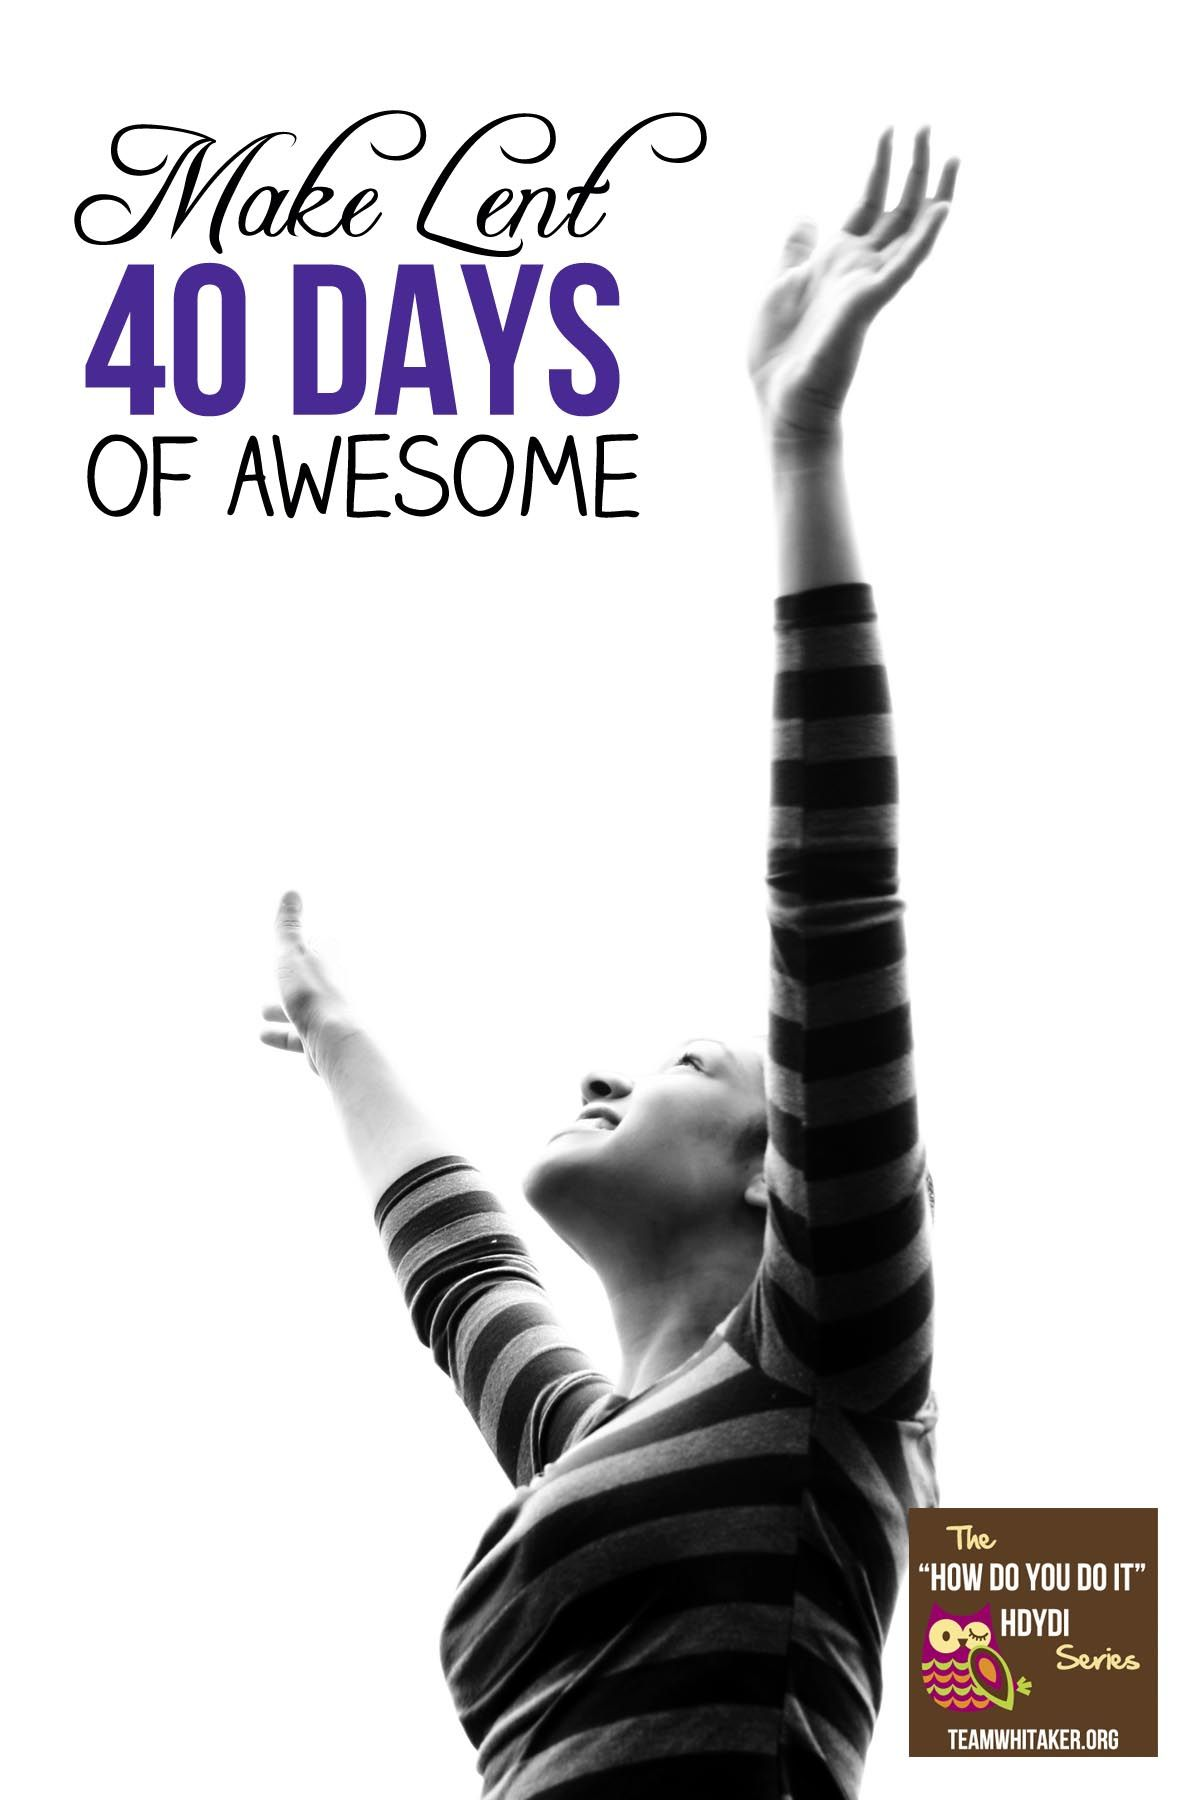 Hdydi Make Lent 40 Days Of Awesome